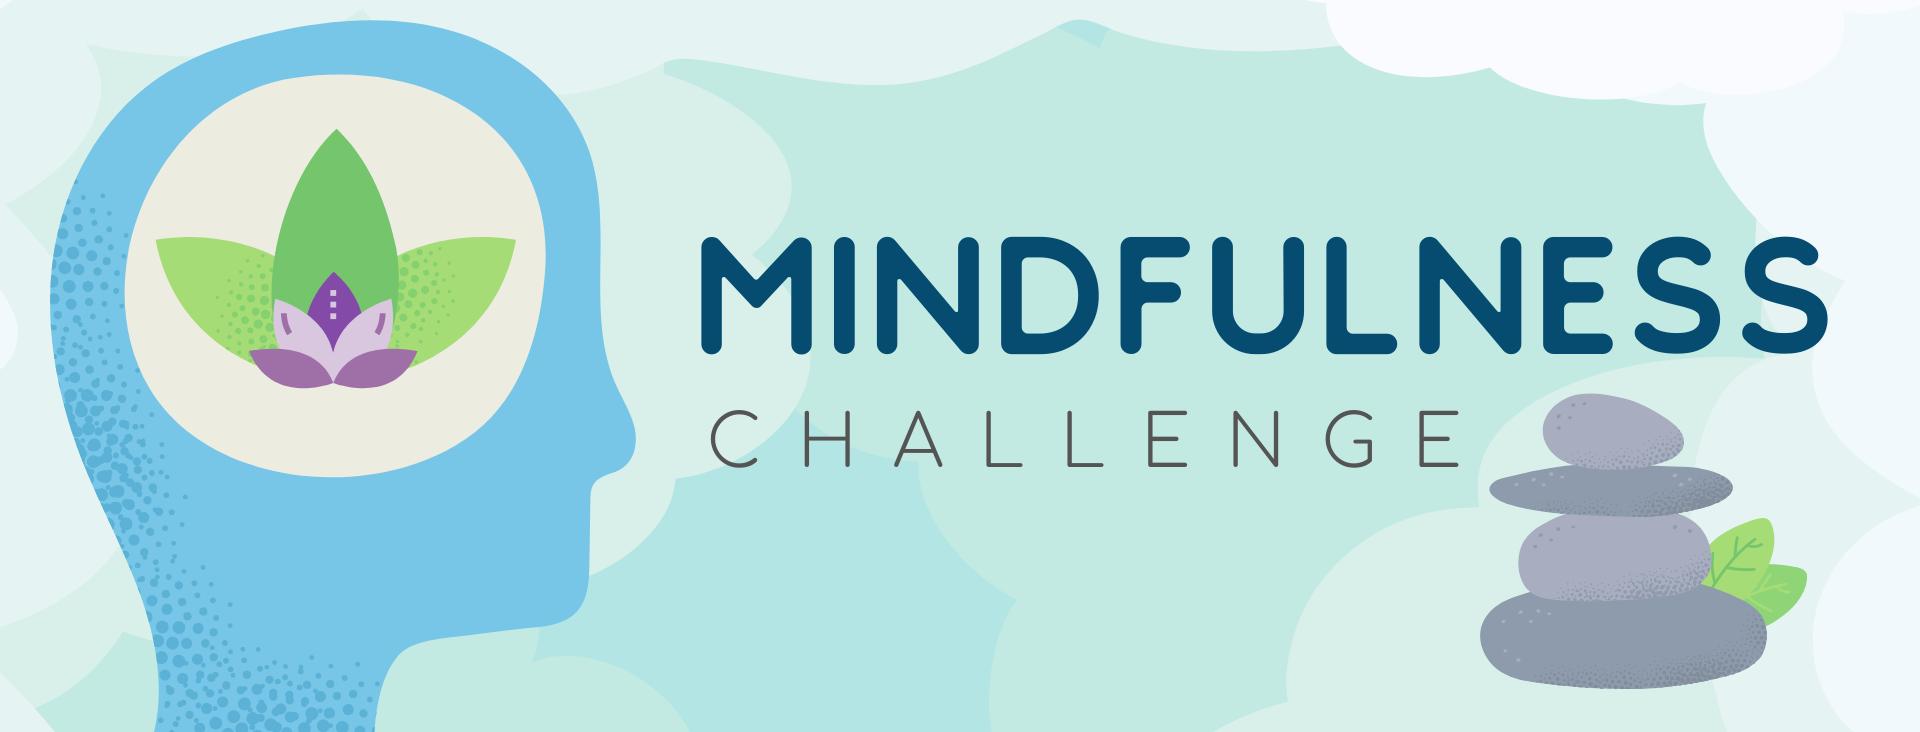 https://zoobean.zendesk.com/hc/en-us/article_attachments/360099210553/Mindfulness_Beanstack_Banner.png